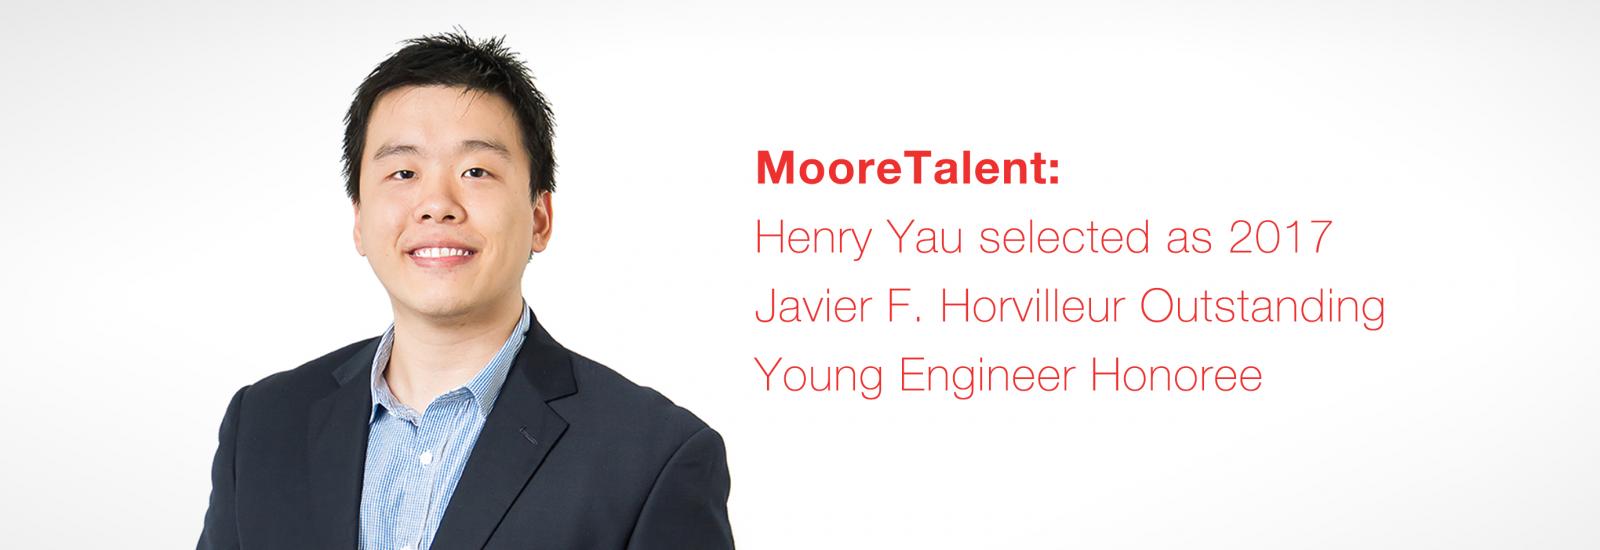 Henry Yau: 2017 Javier F. Horvilleur Outstanding Young Engineer Honoree